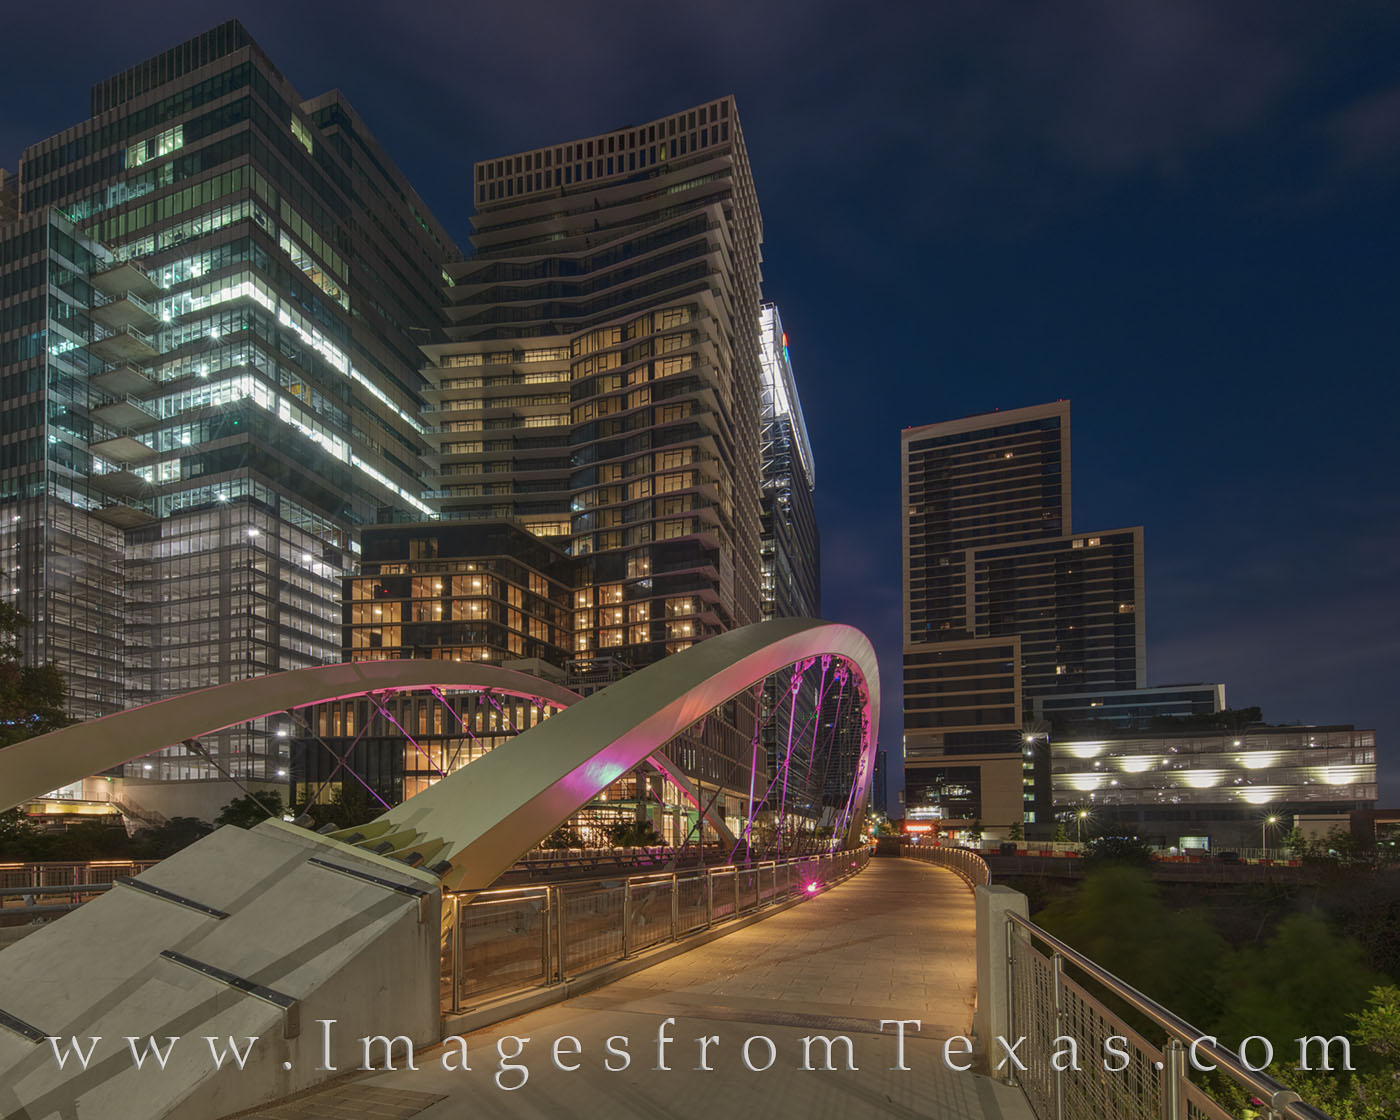 butterfly bridge, austin, downtown high rise, shoal creek, ladybird lake, 2nd street, morning, dark, bridge, pedestrian, photo